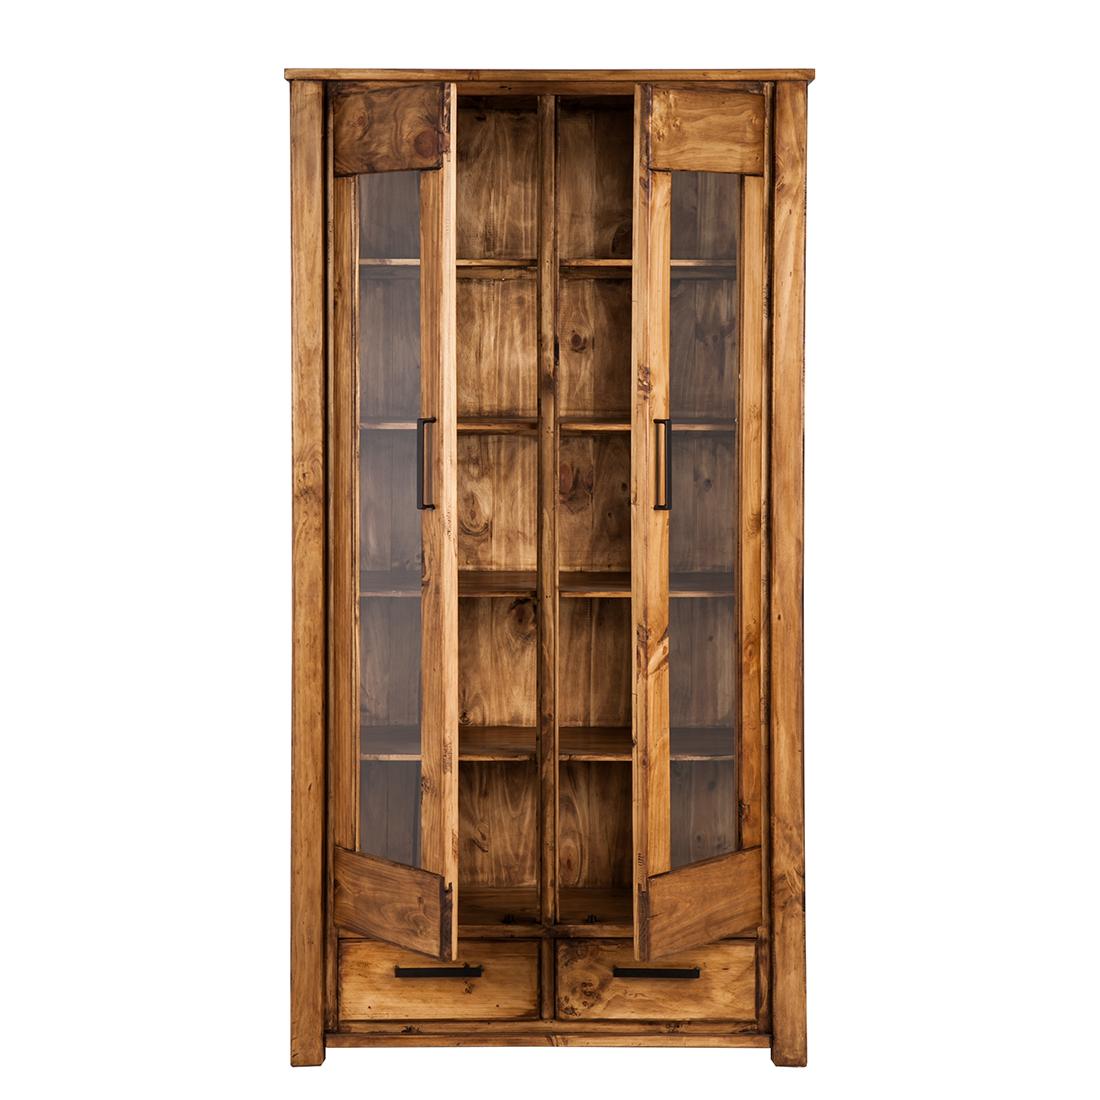 vitrine pinie massivholz 2 t rig hochschrank esszimmer k che buffet schrank neu ebay. Black Bedroom Furniture Sets. Home Design Ideas